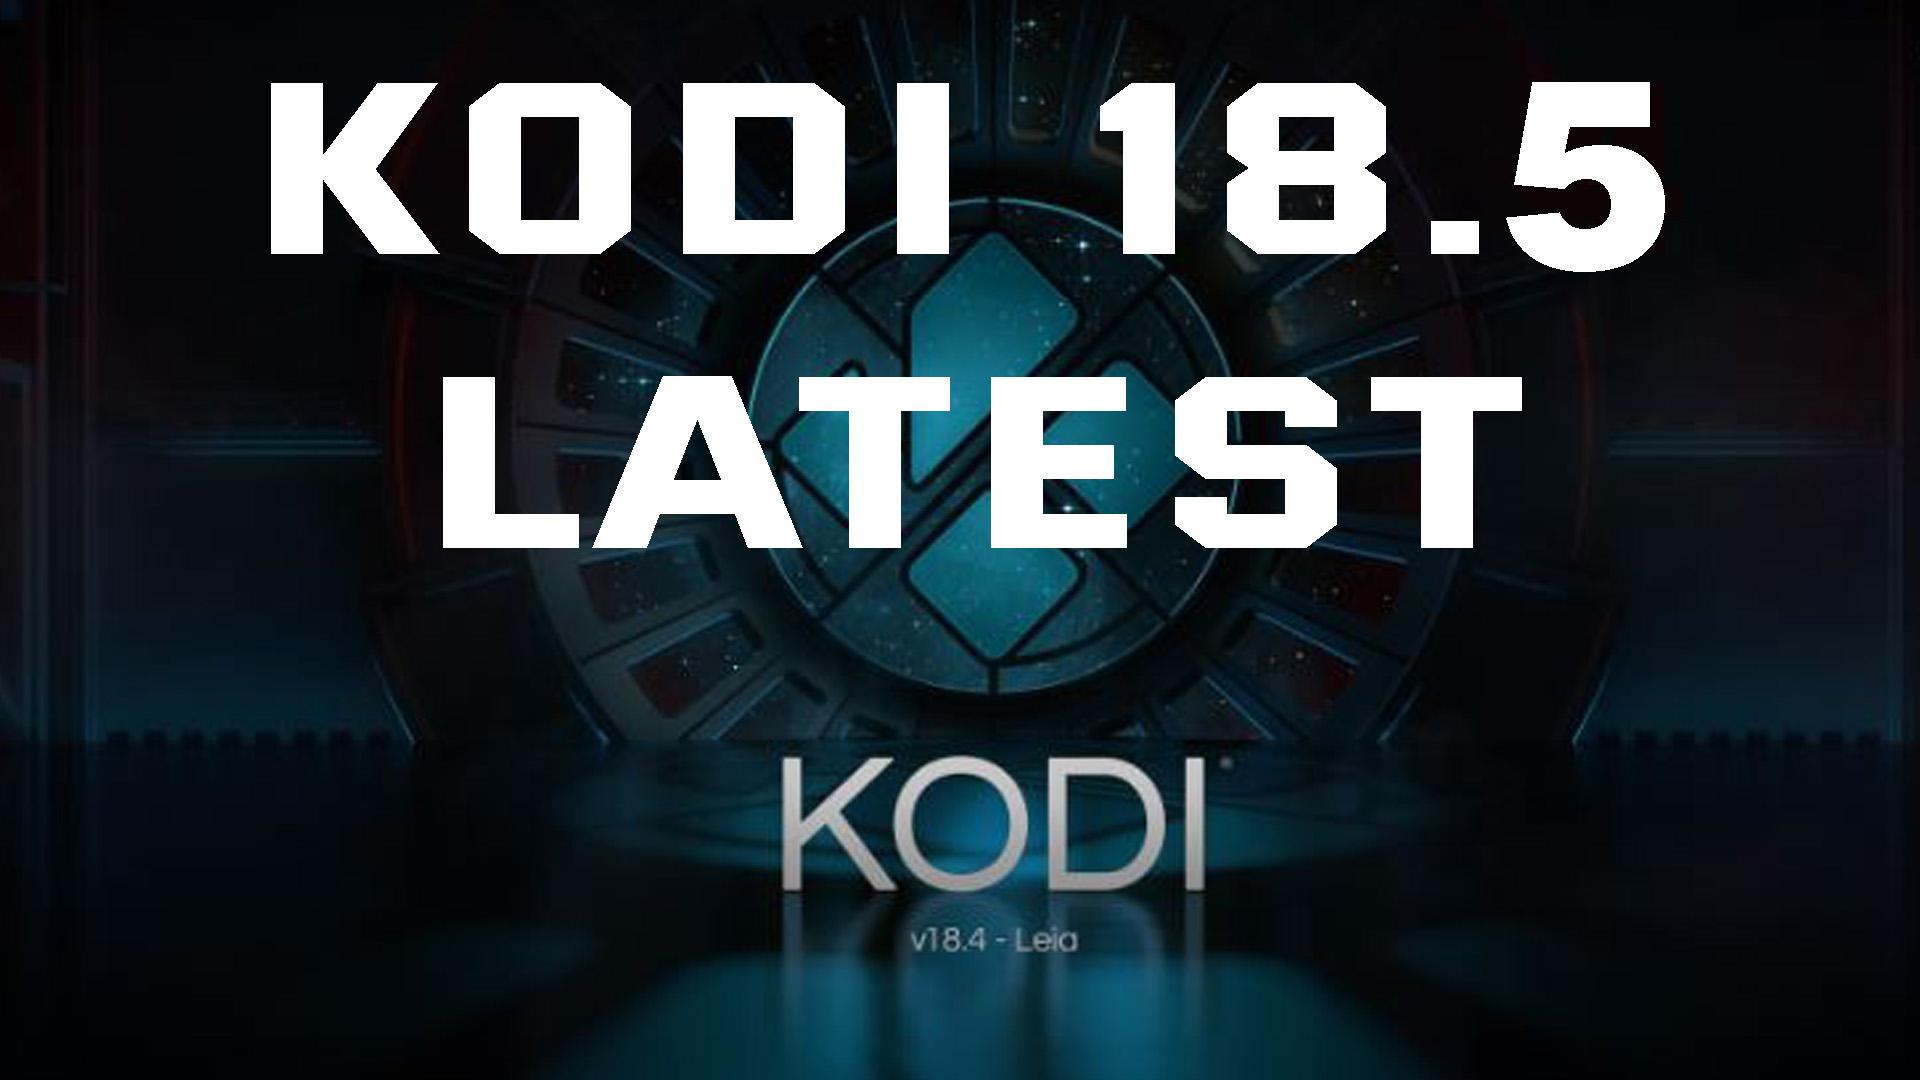 Kodi 18.5 Update